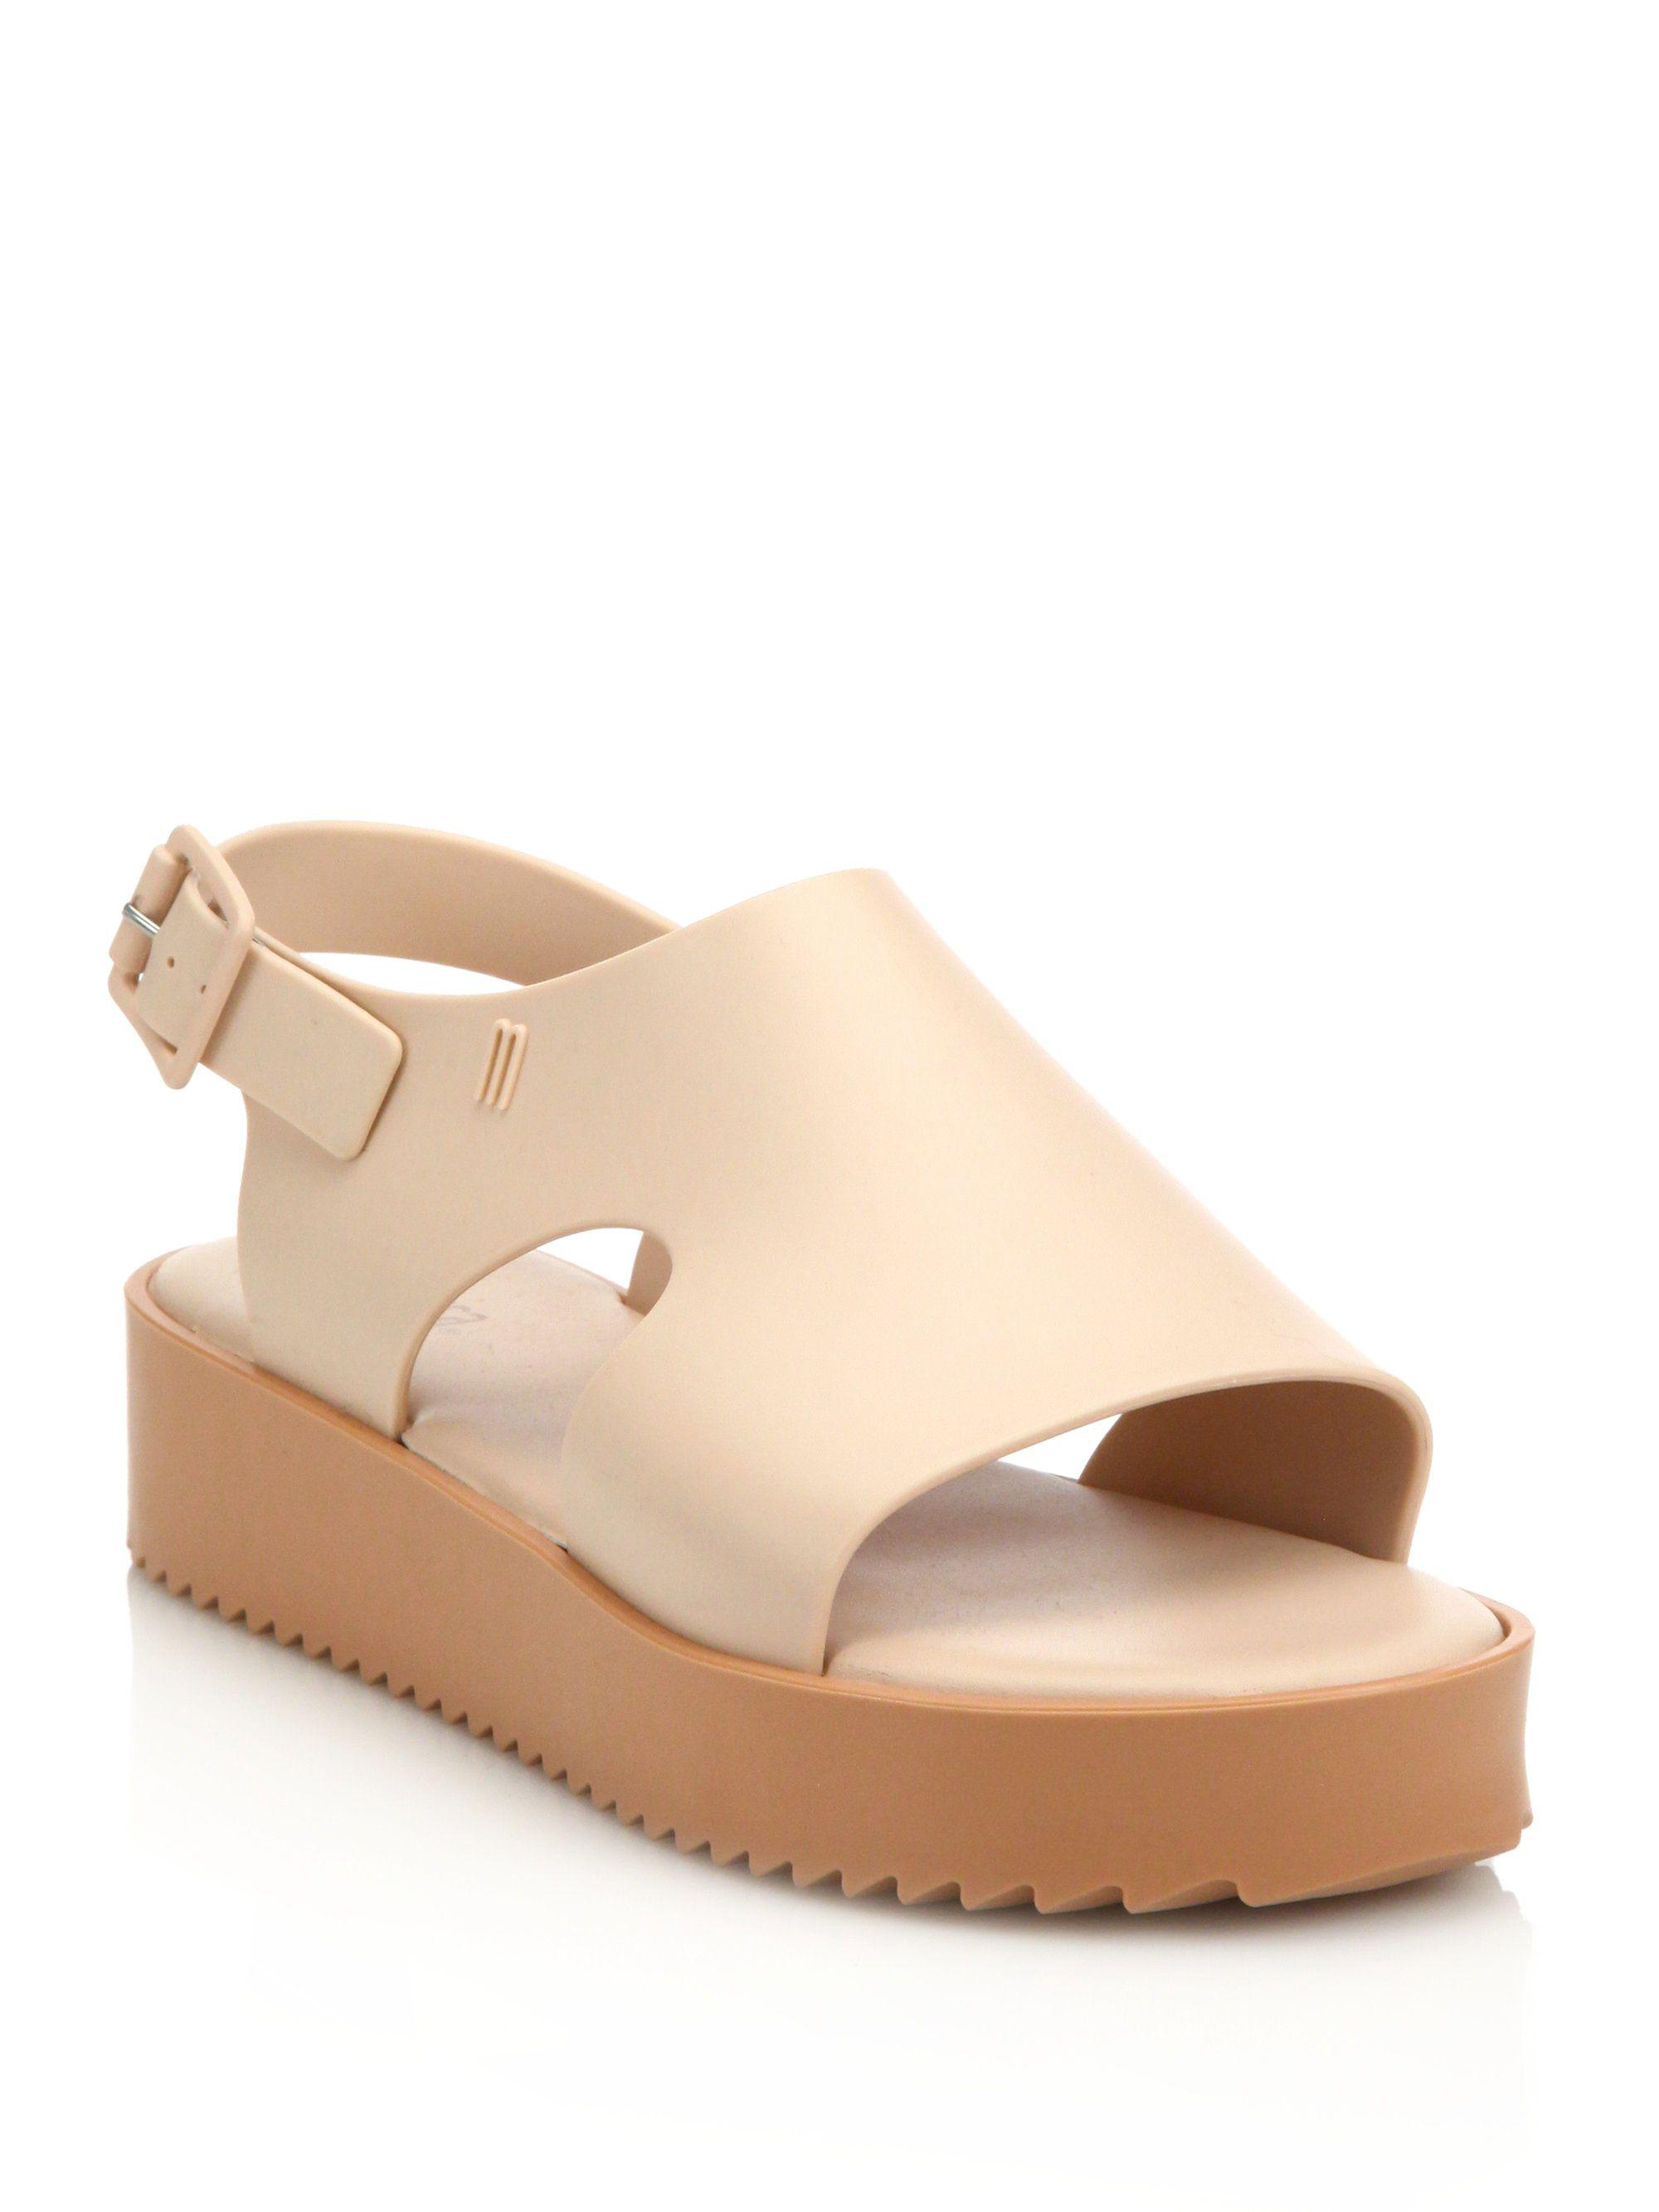 7b34a3891f03 Melissa Hotness Platform Wedge Sandals in Pink